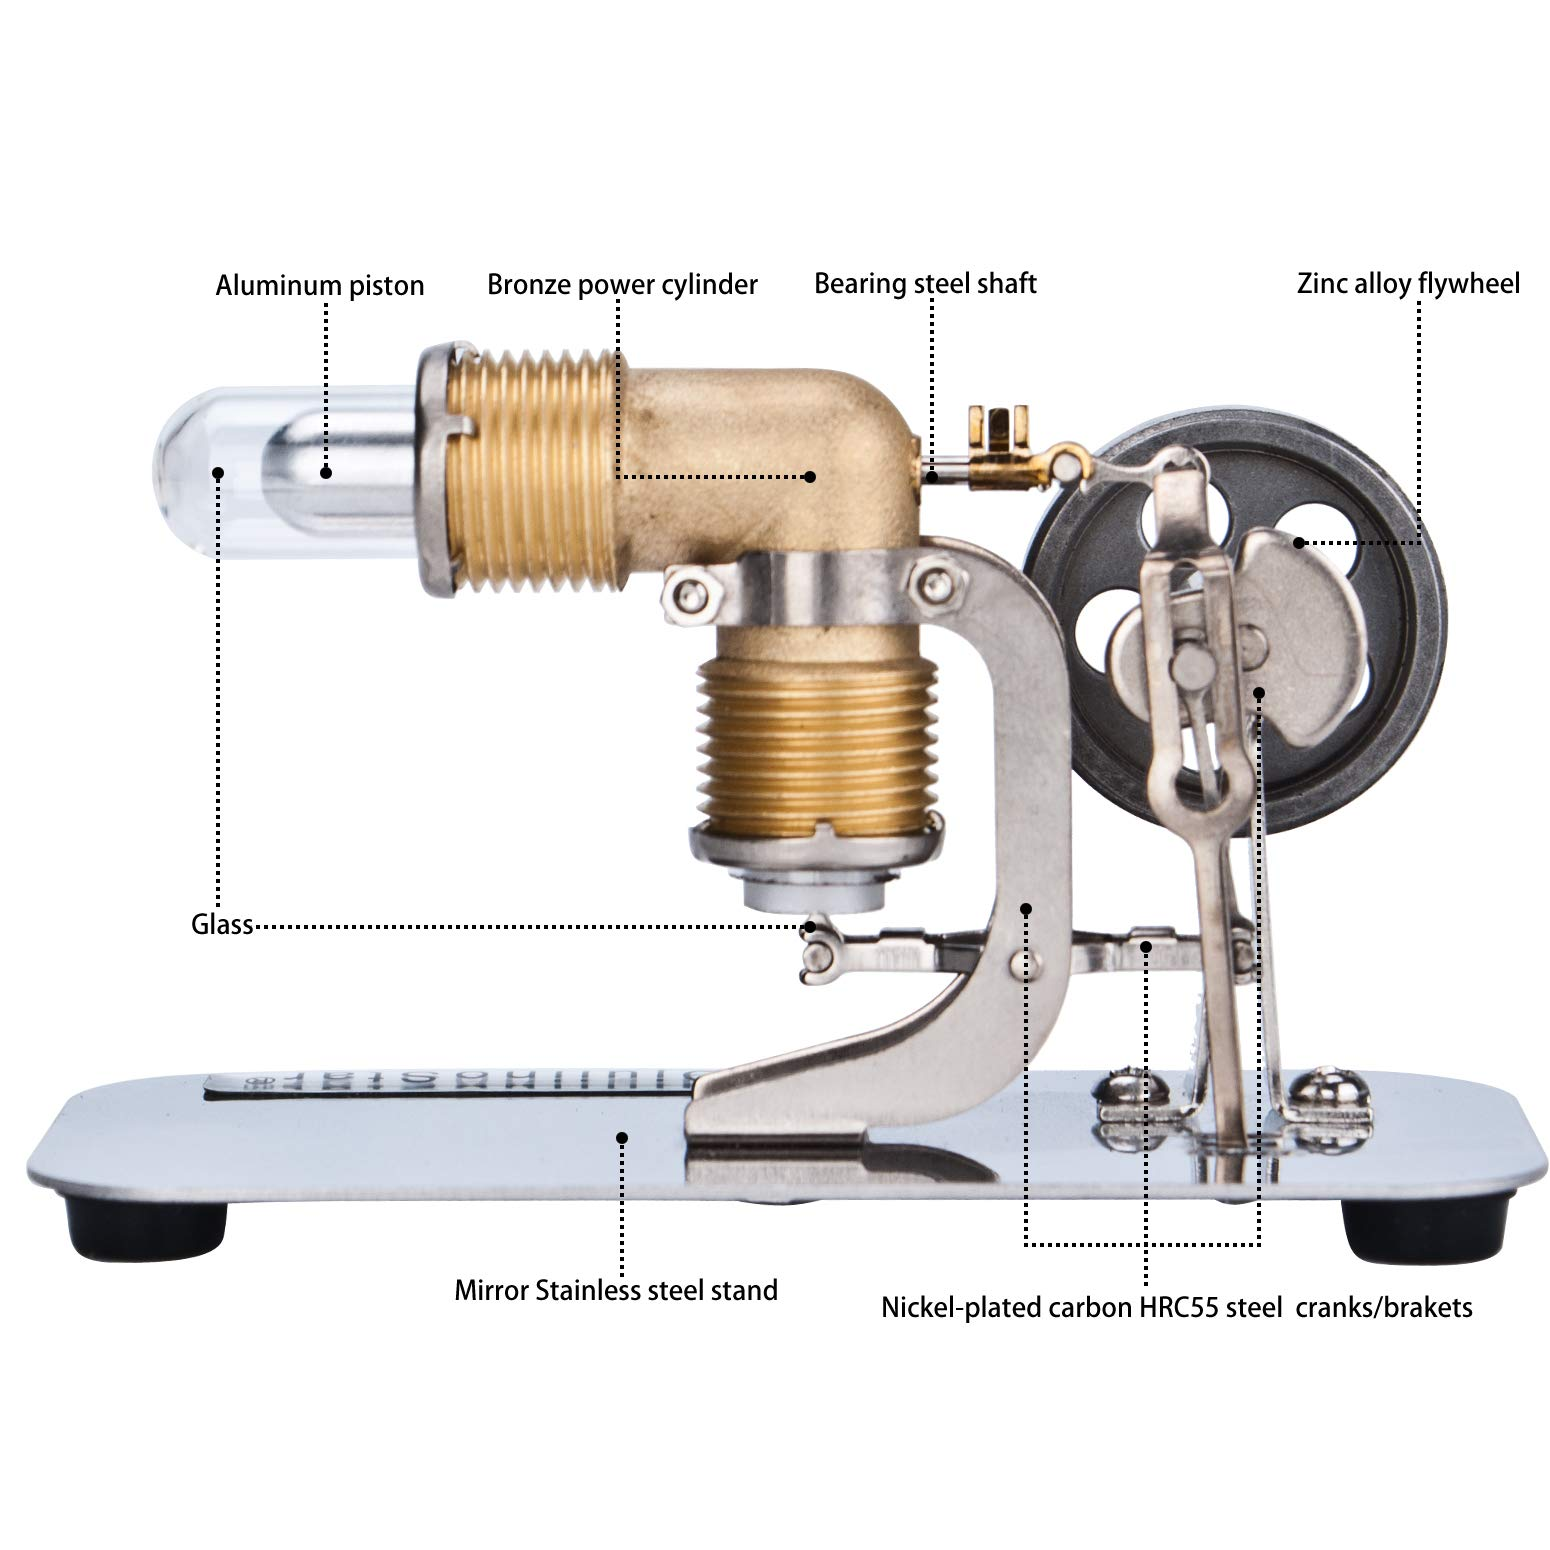 DjuiinoStar Mini Hot Air Stirling Engine: A High Performance Pocket-Sized Working Model by DjuiinoStar (Image #3)